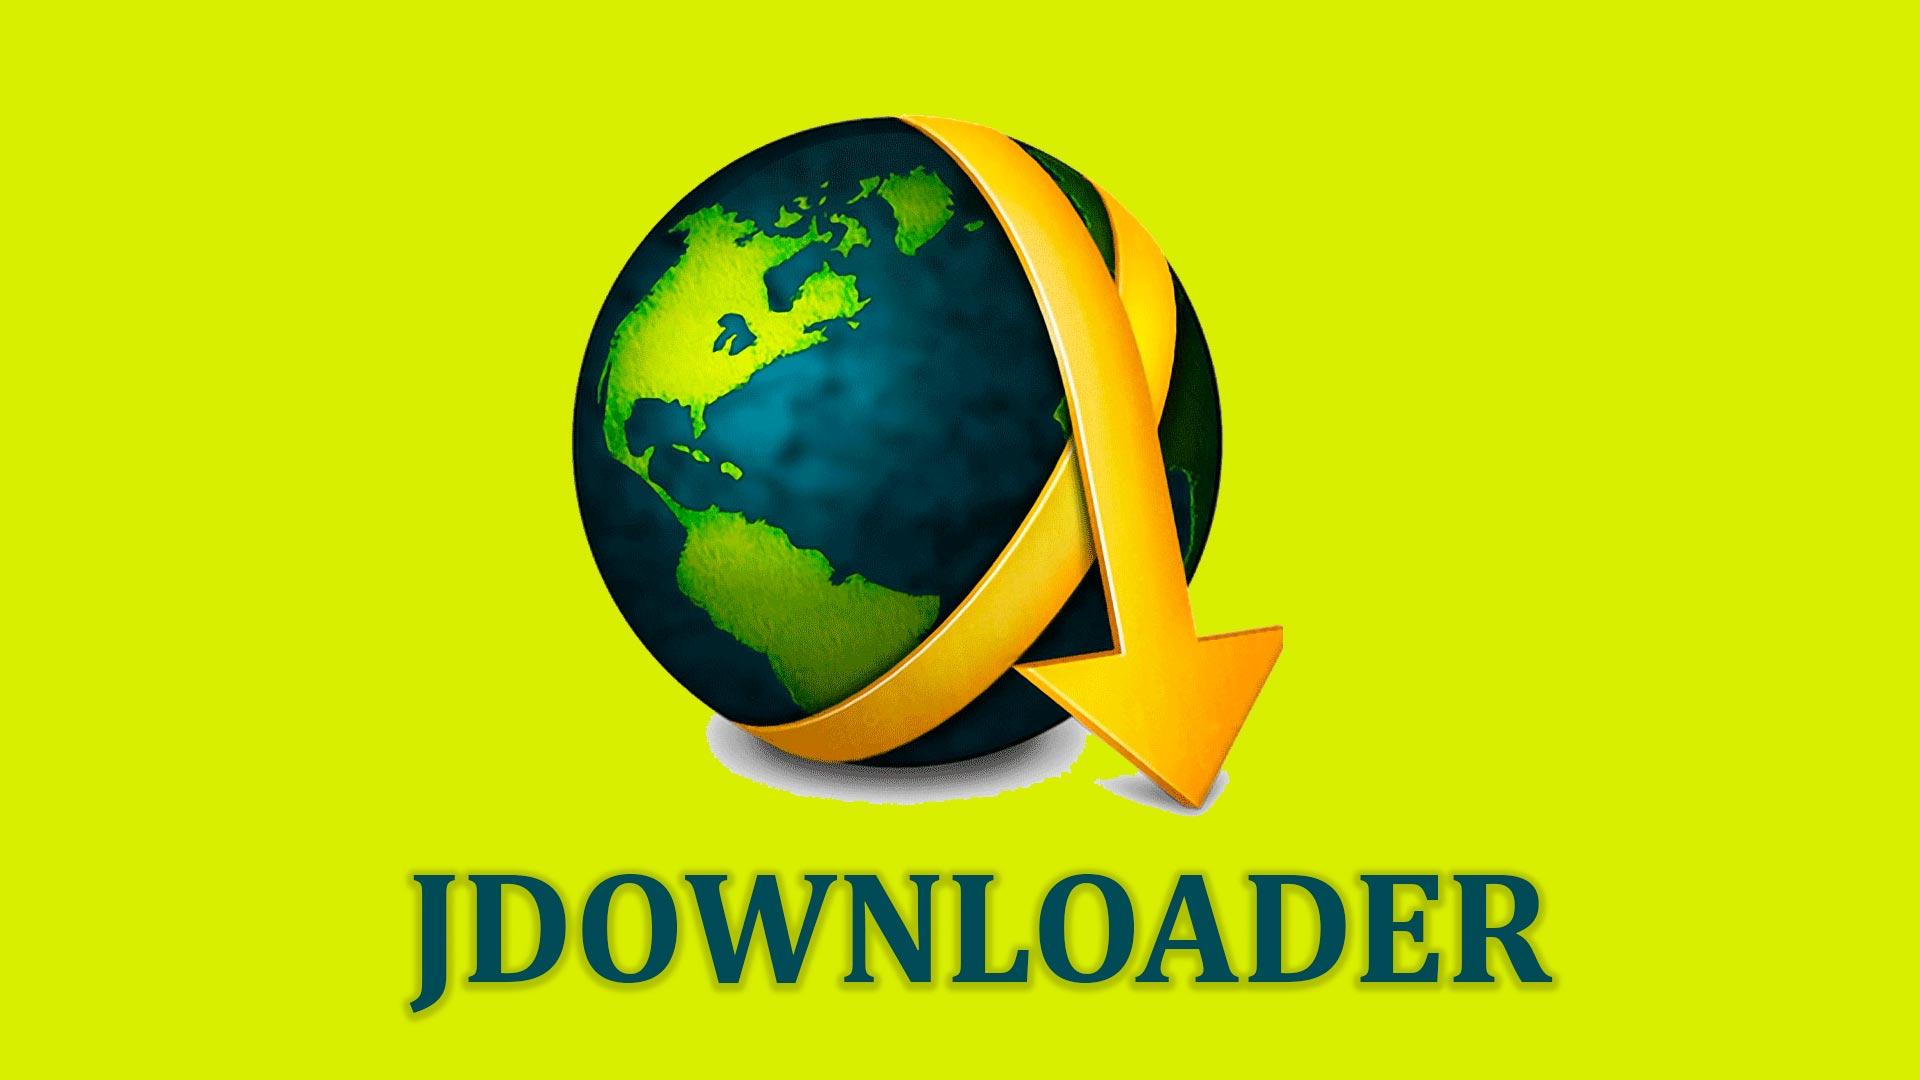 jdownloader -portada